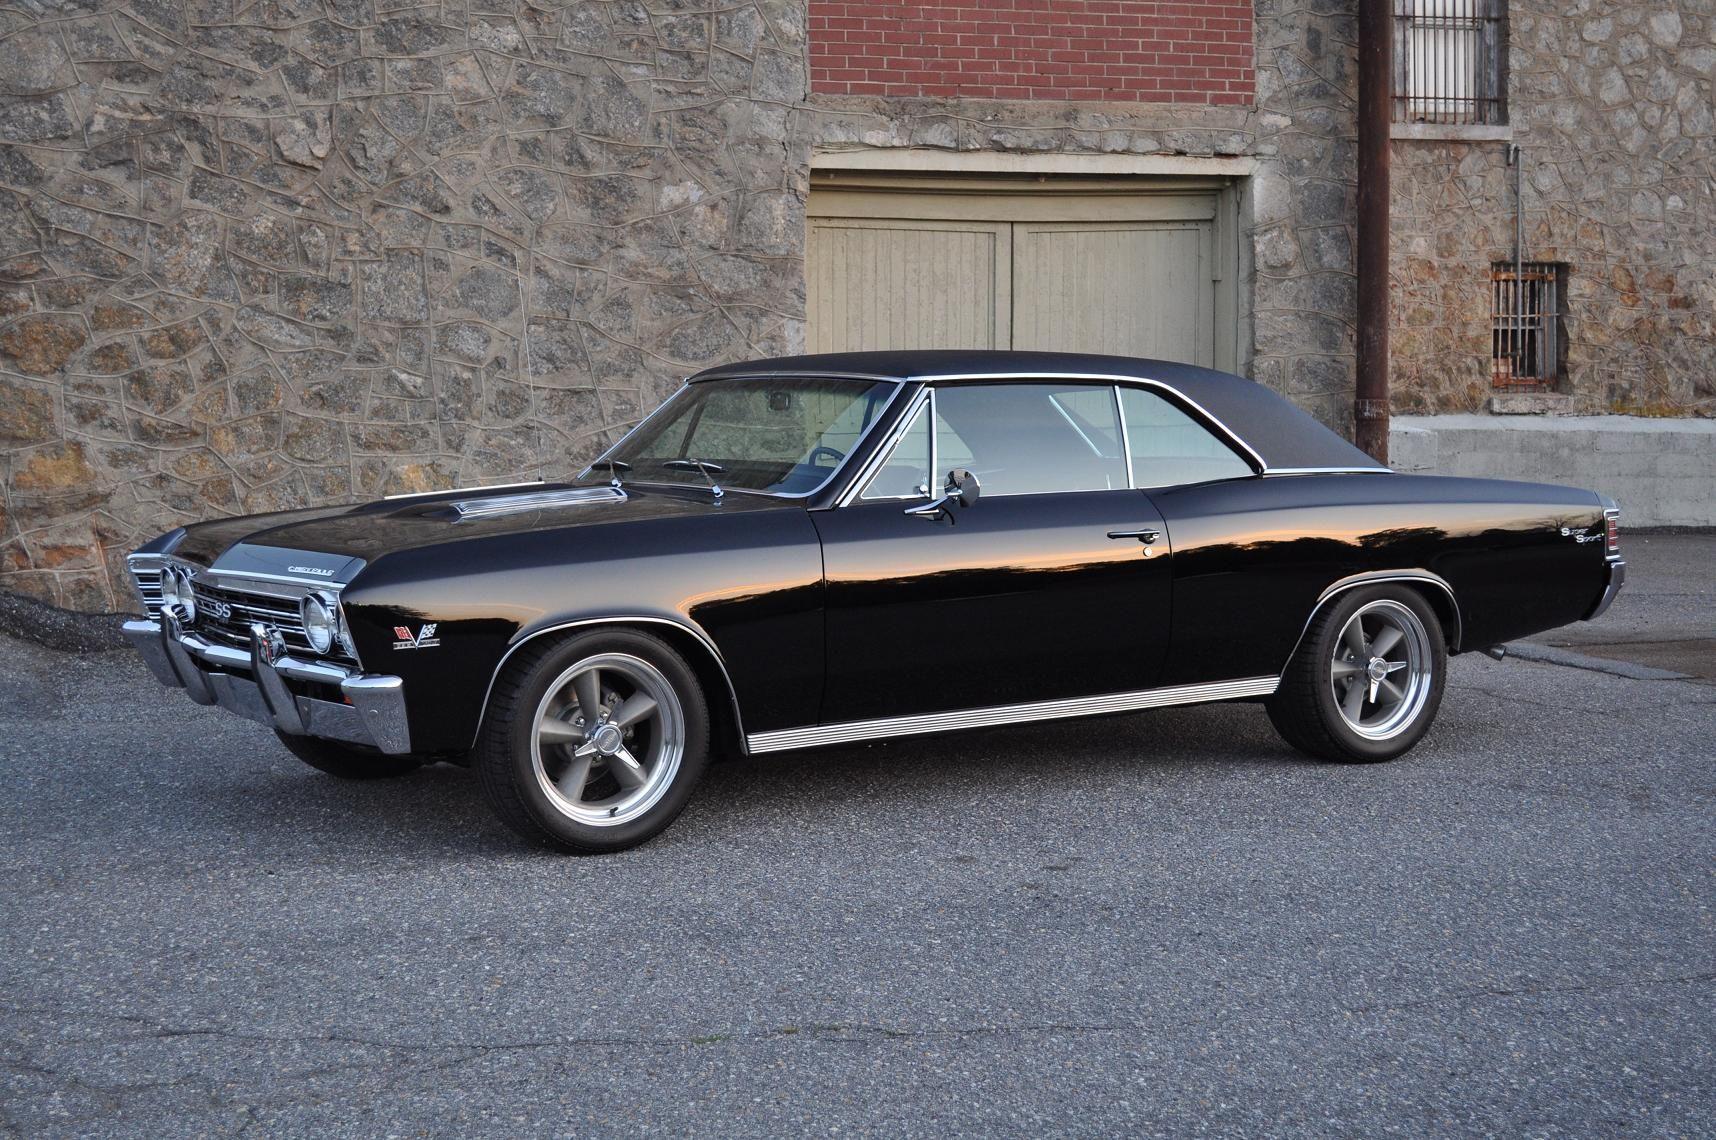 1967 Chevelle SS | 1966-1967 Chevy Chevelle SS | Pinterest | 1967 ...